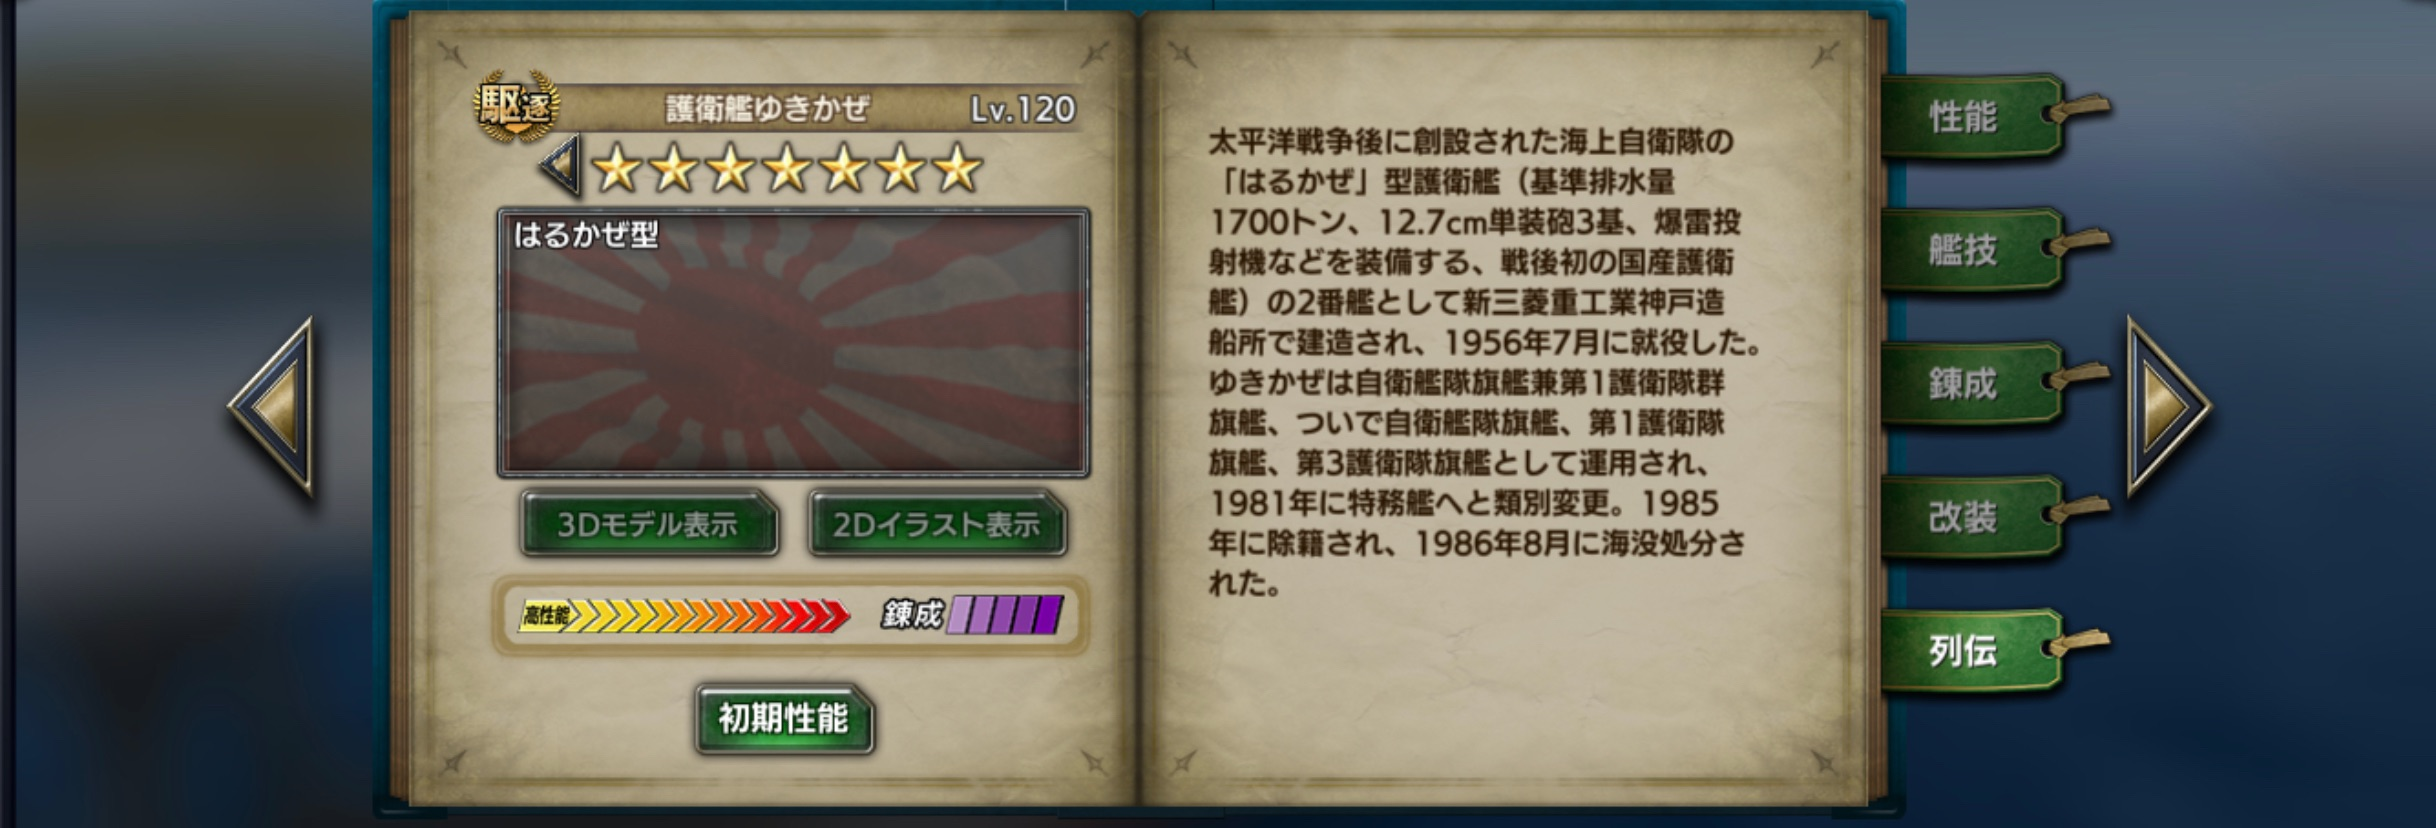 EYukikaze-history